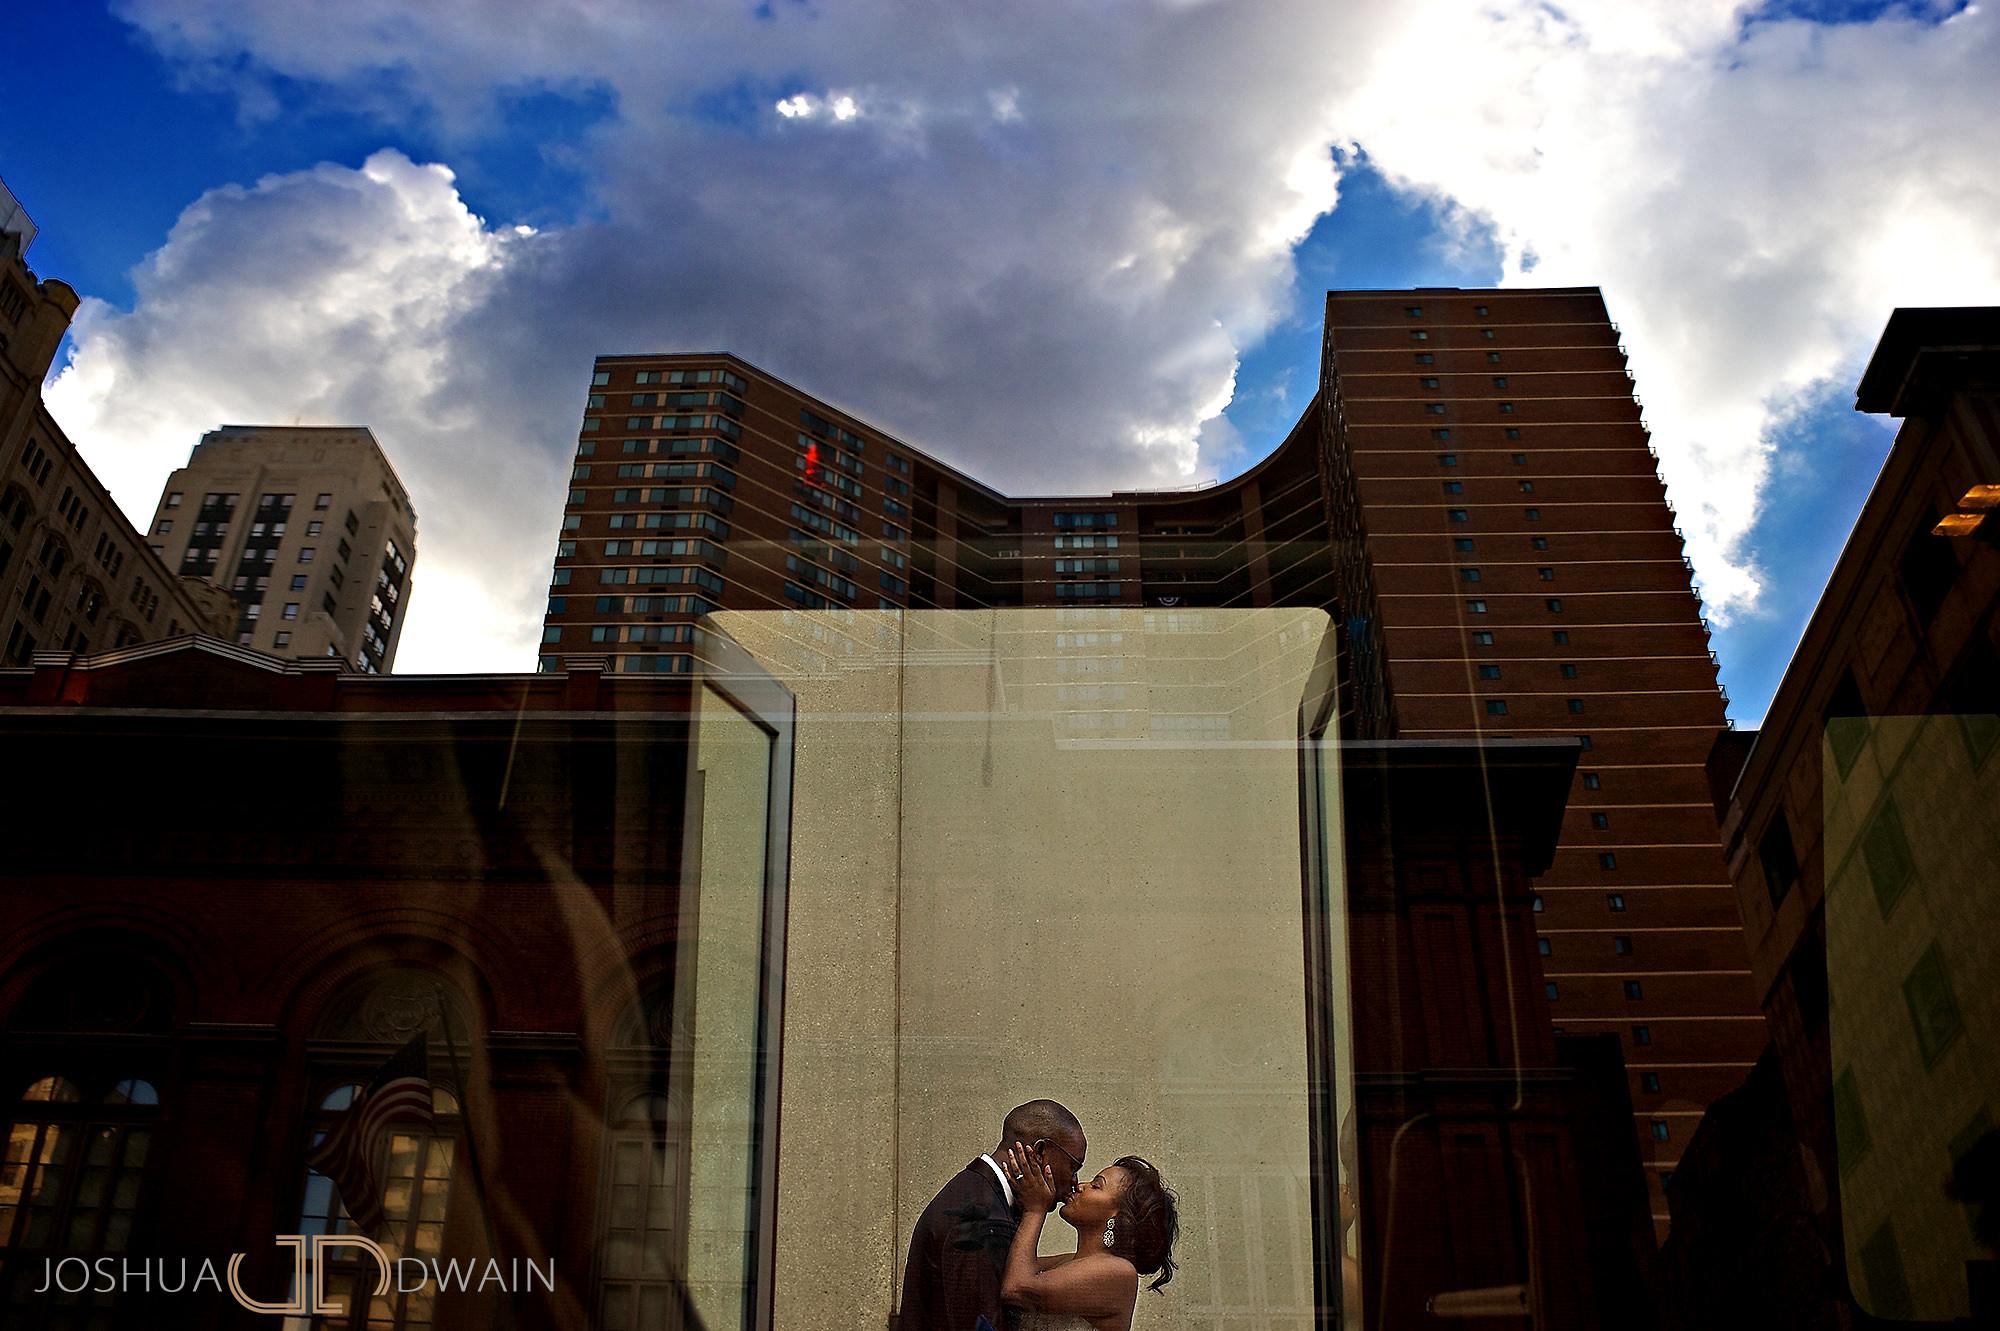 tiffany-udo-001-tendenza-philadelphia-pa-wedding-photographer-joshua-dwain-photography-